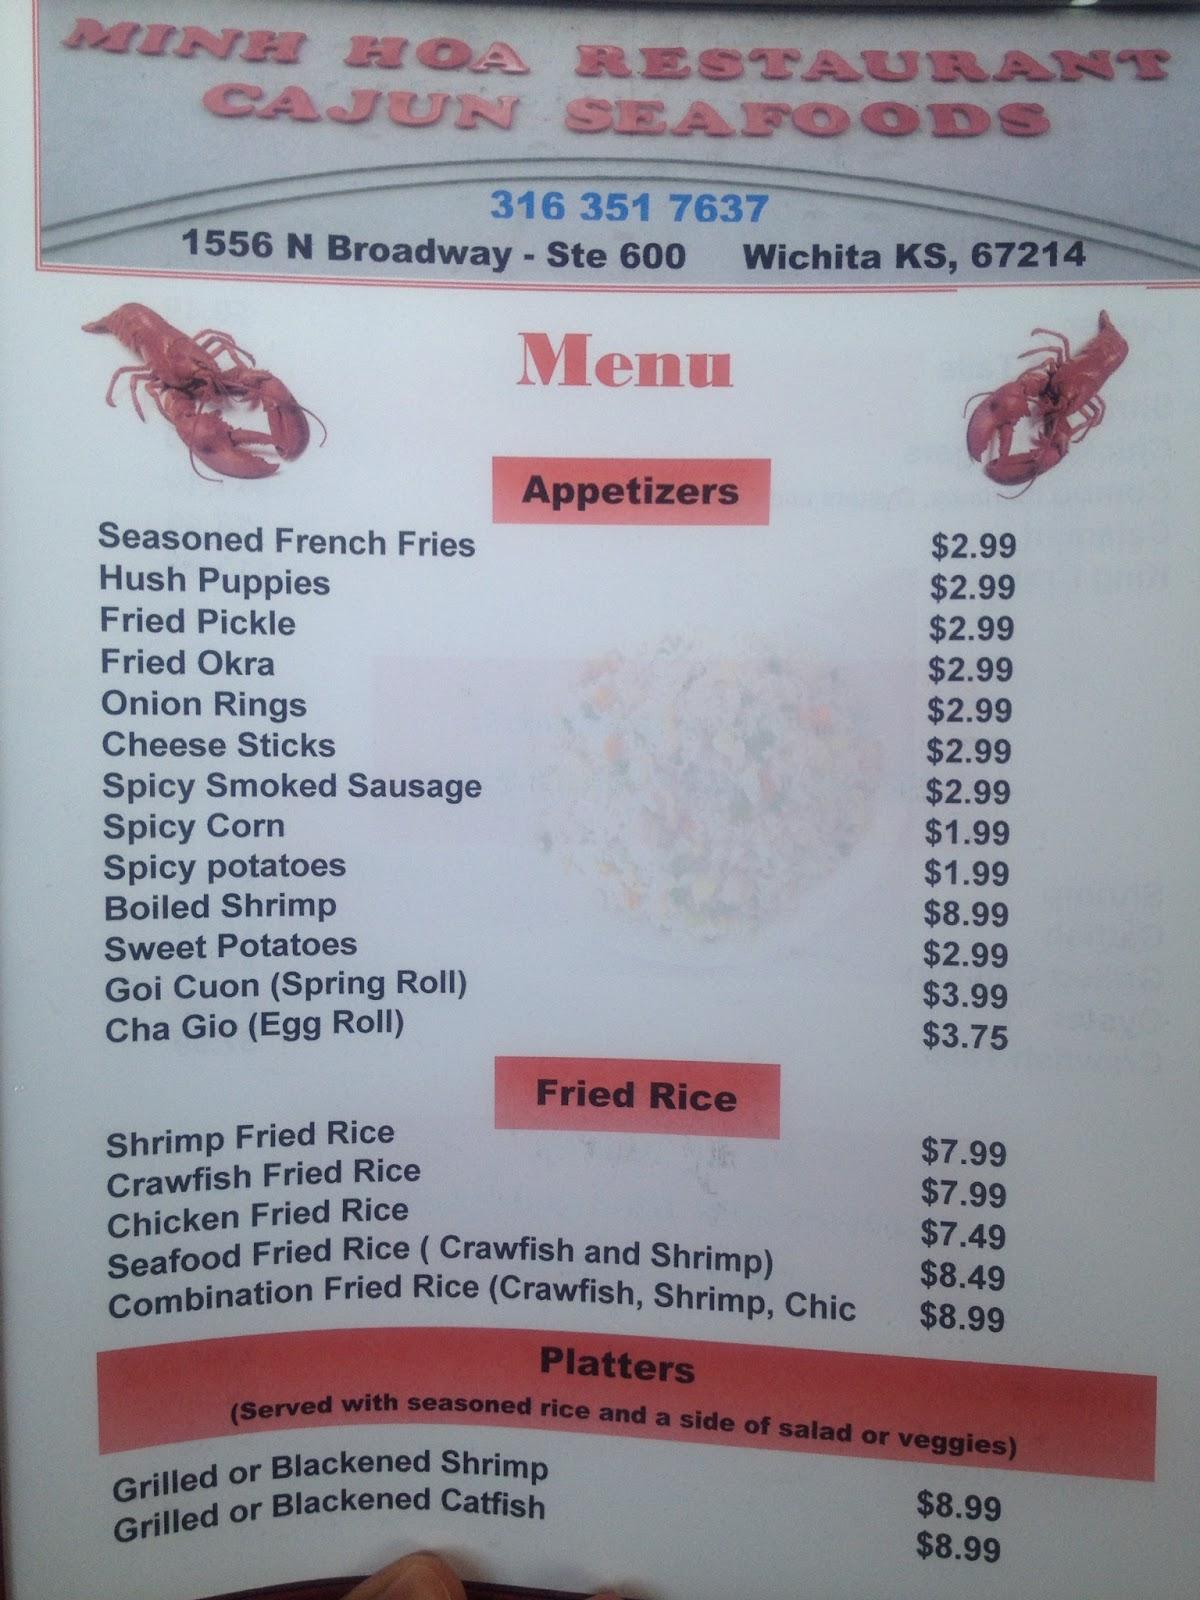 Minh Hoa Restaurant & Cajun Seafood Reviewed (CLOSED) – Wichita By E.B.